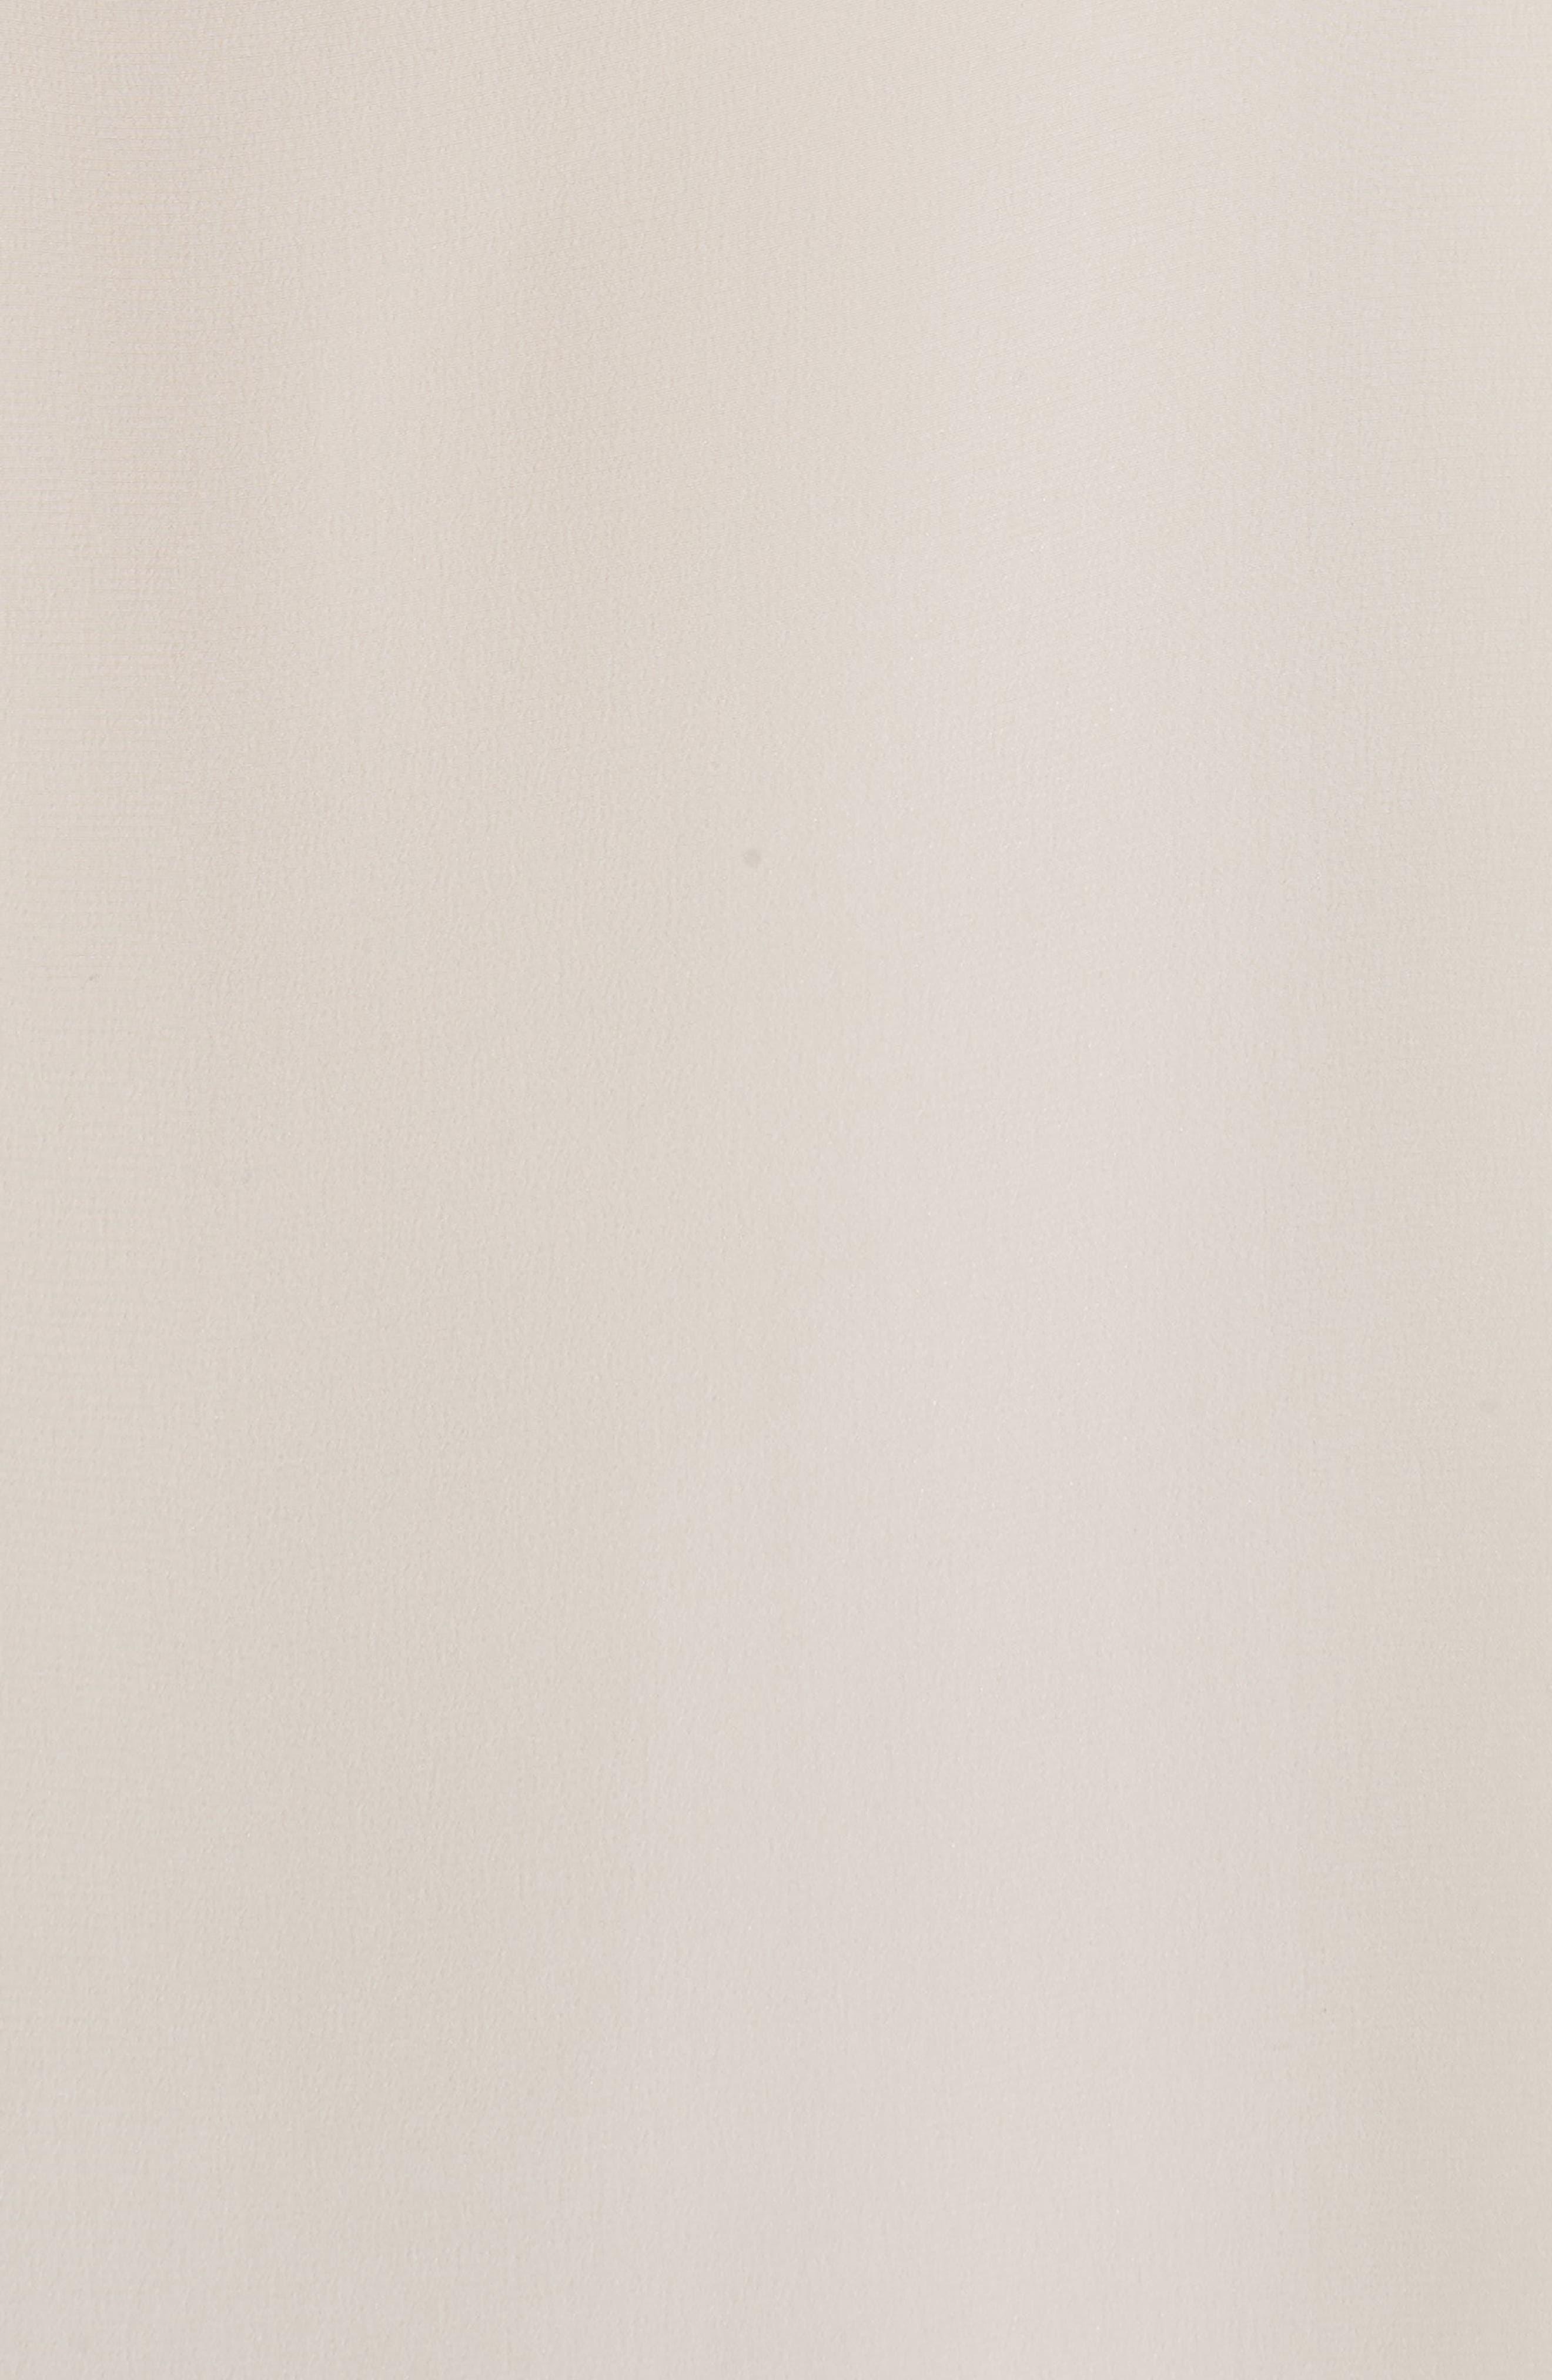 Scarf Neck Silk Crêpe de Chine Blouse,                             Alternate thumbnail 5, color,                             WHITE